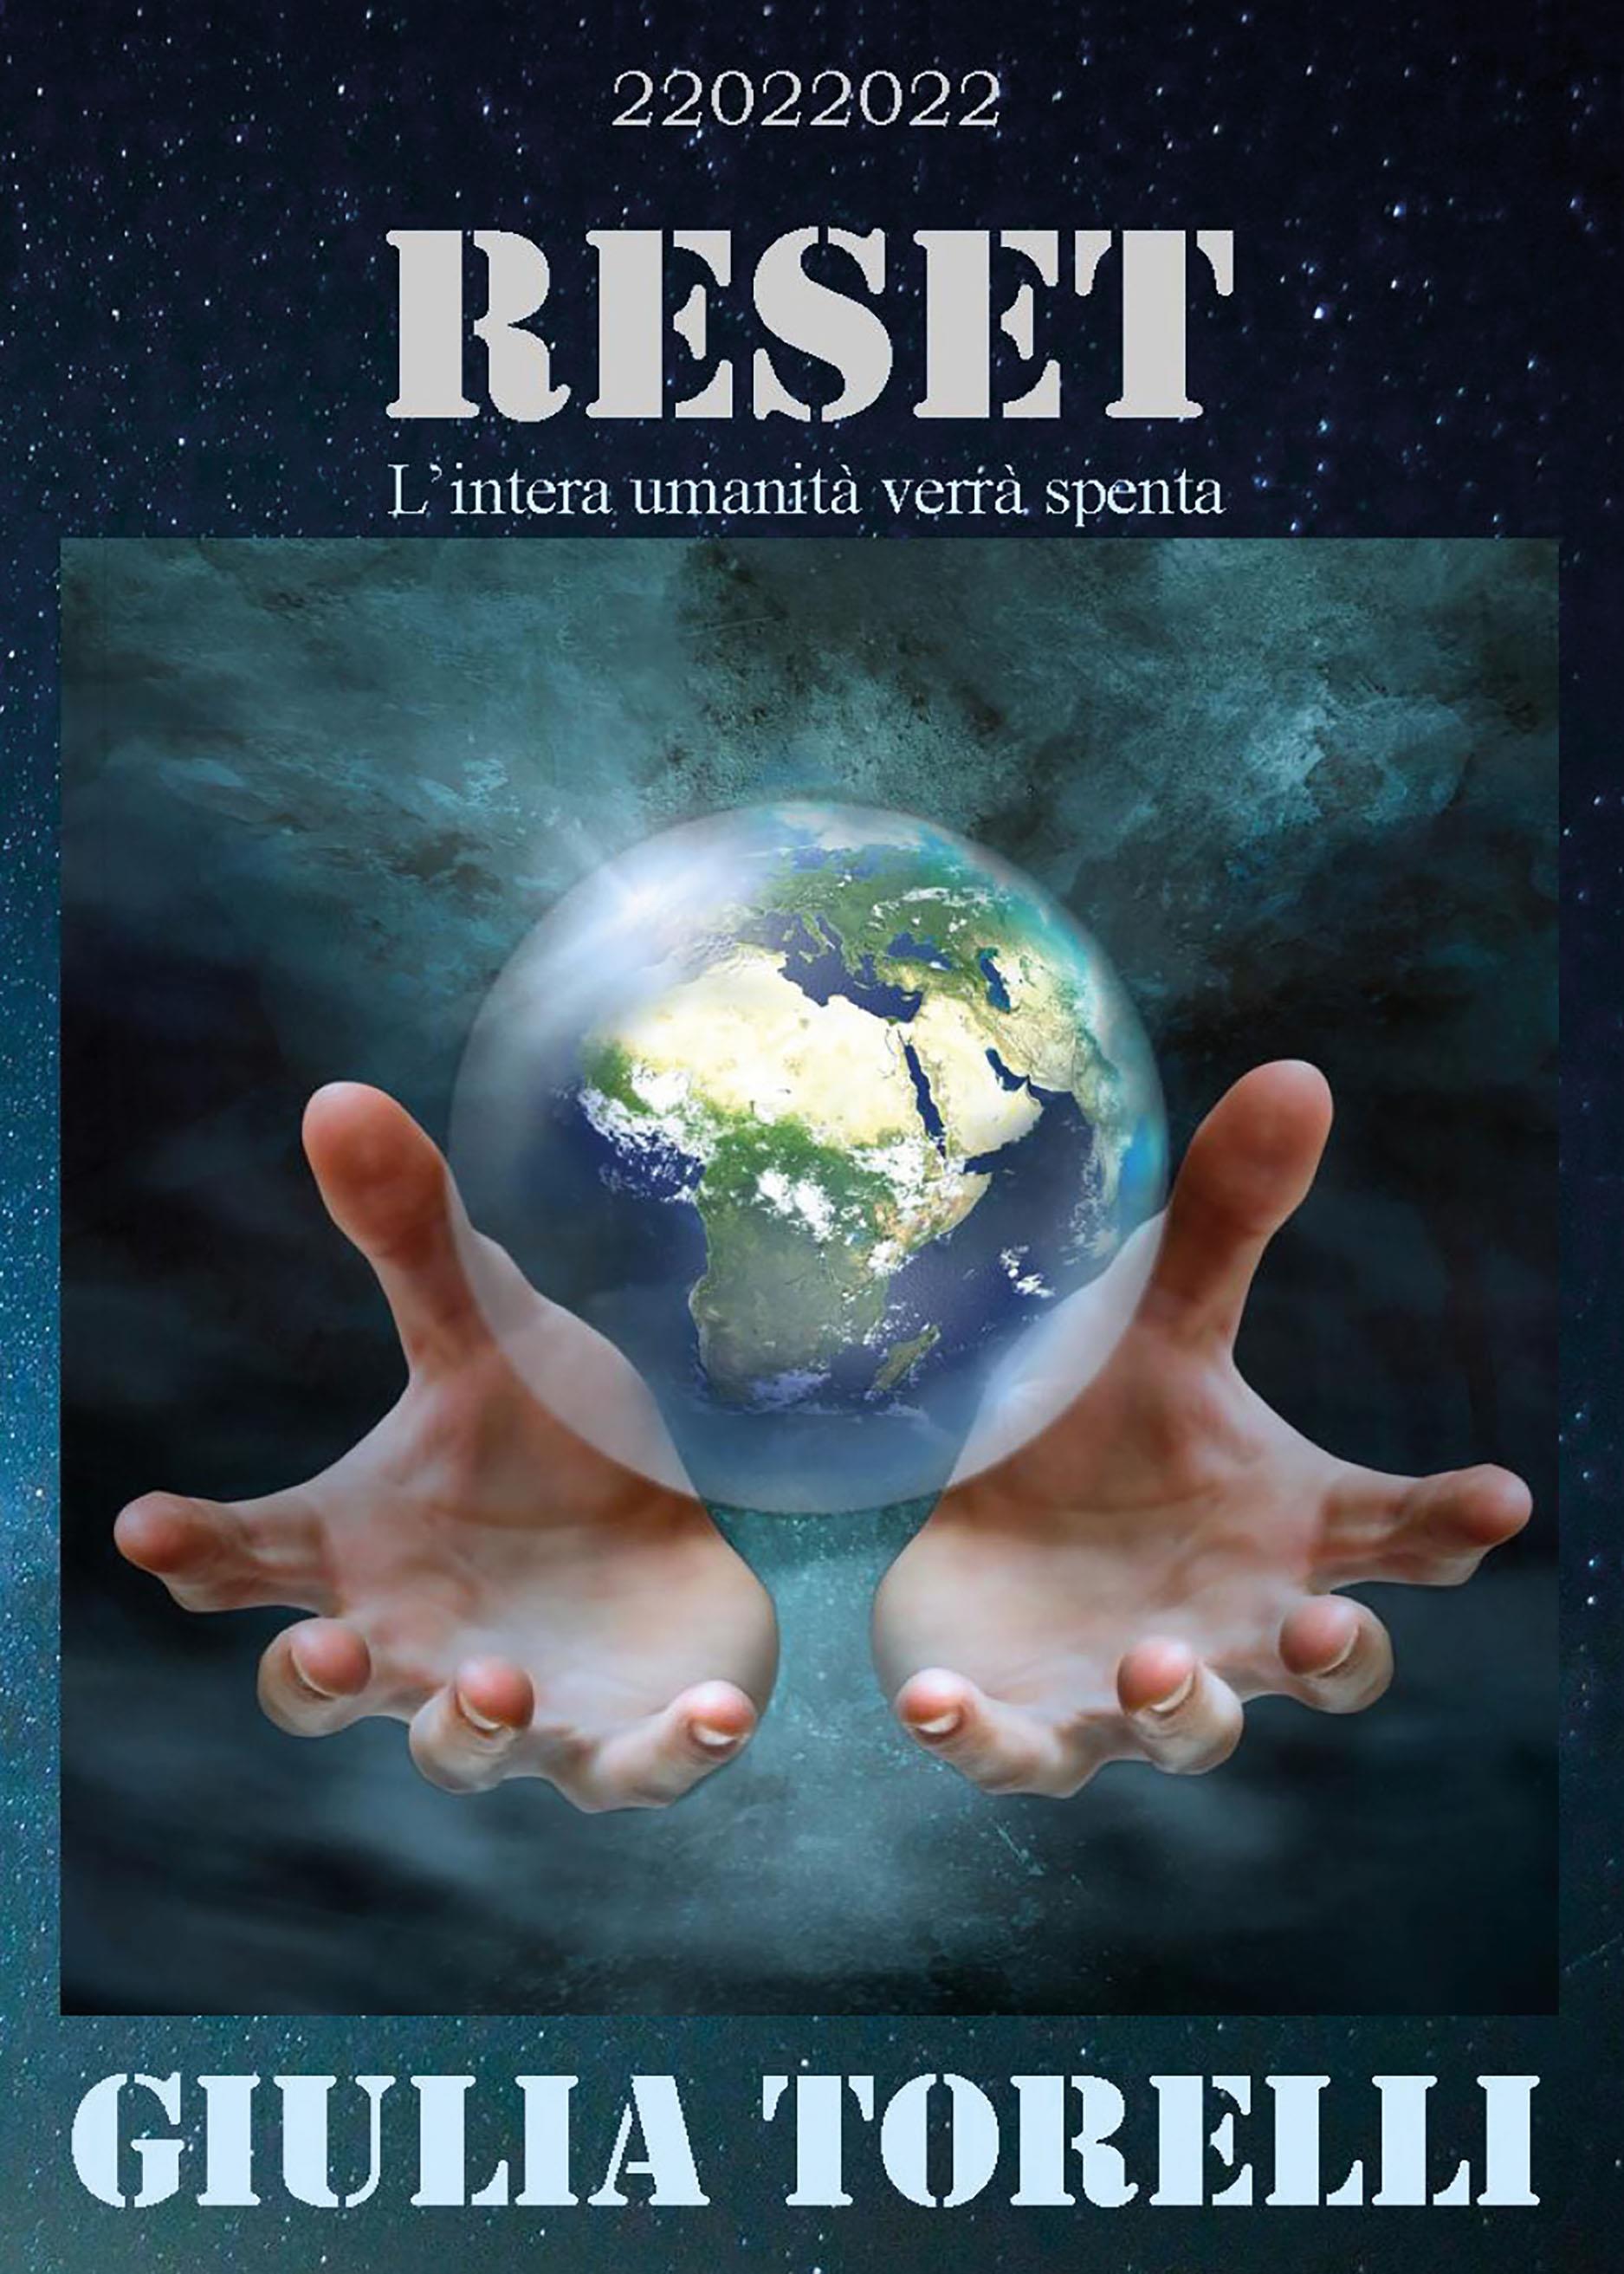 RESET - L'intera umanità verrà spenta